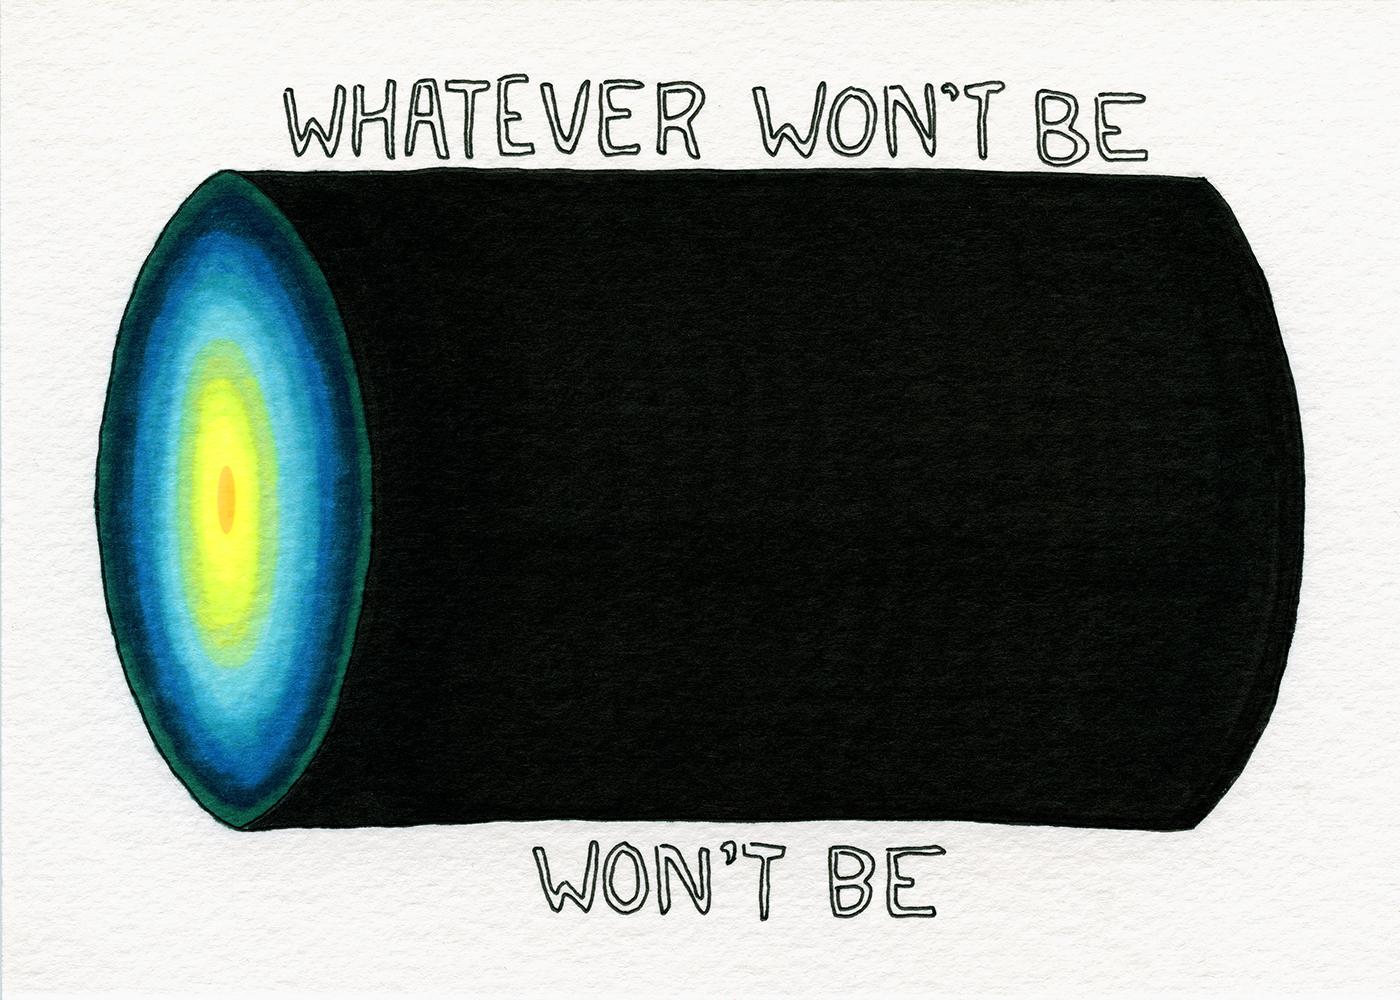 11_whatever_wont_be_wont_be.jpg